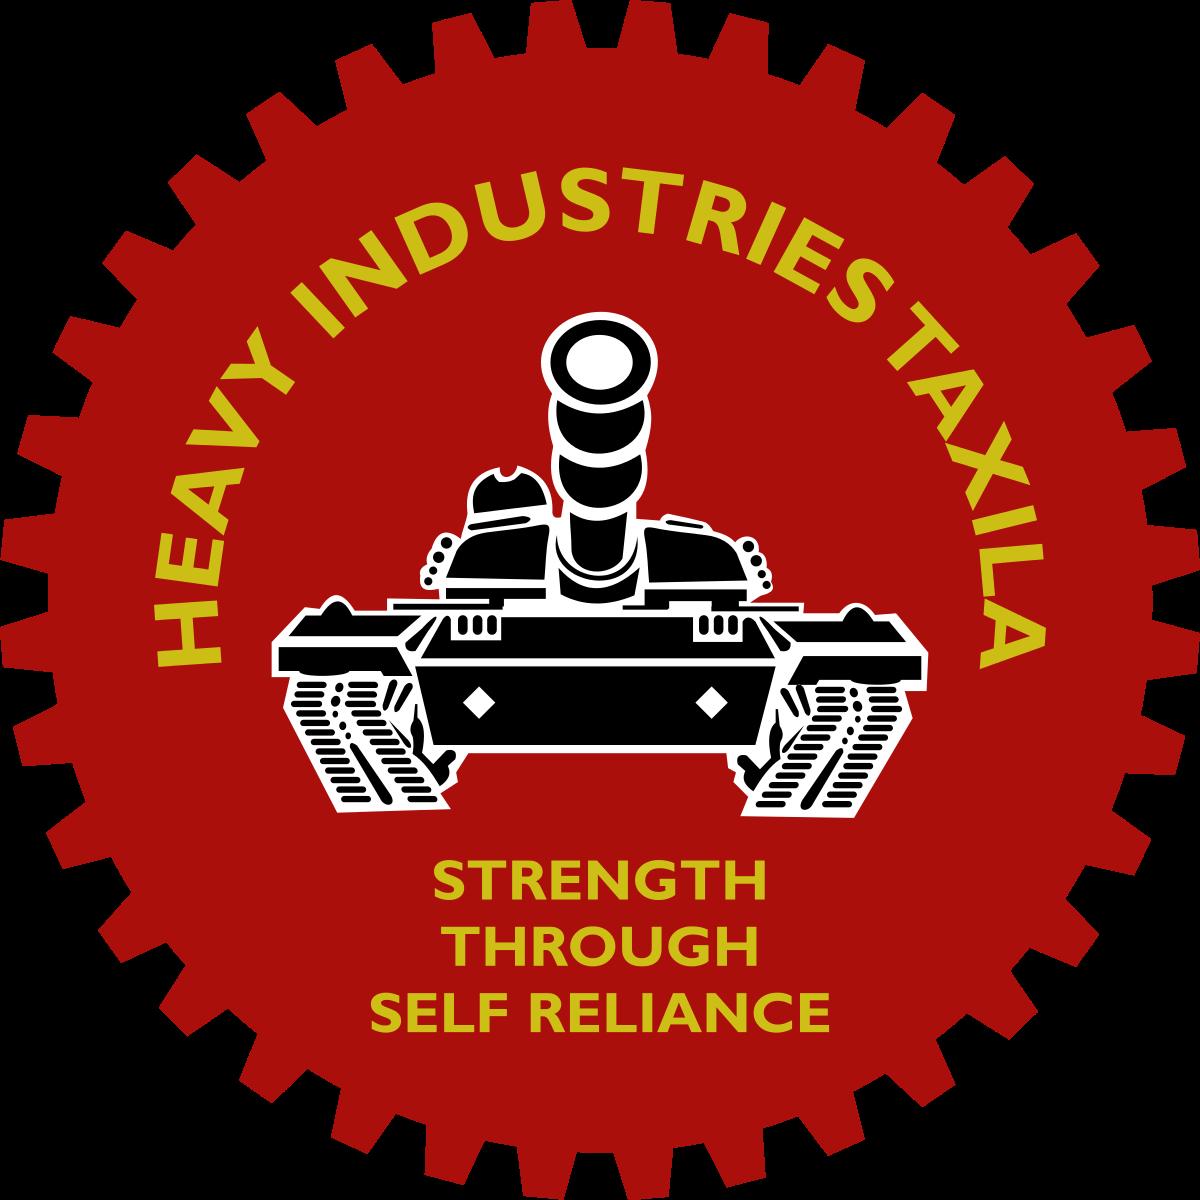 Industries taxila wikipedia . Industry clipart heavy industry